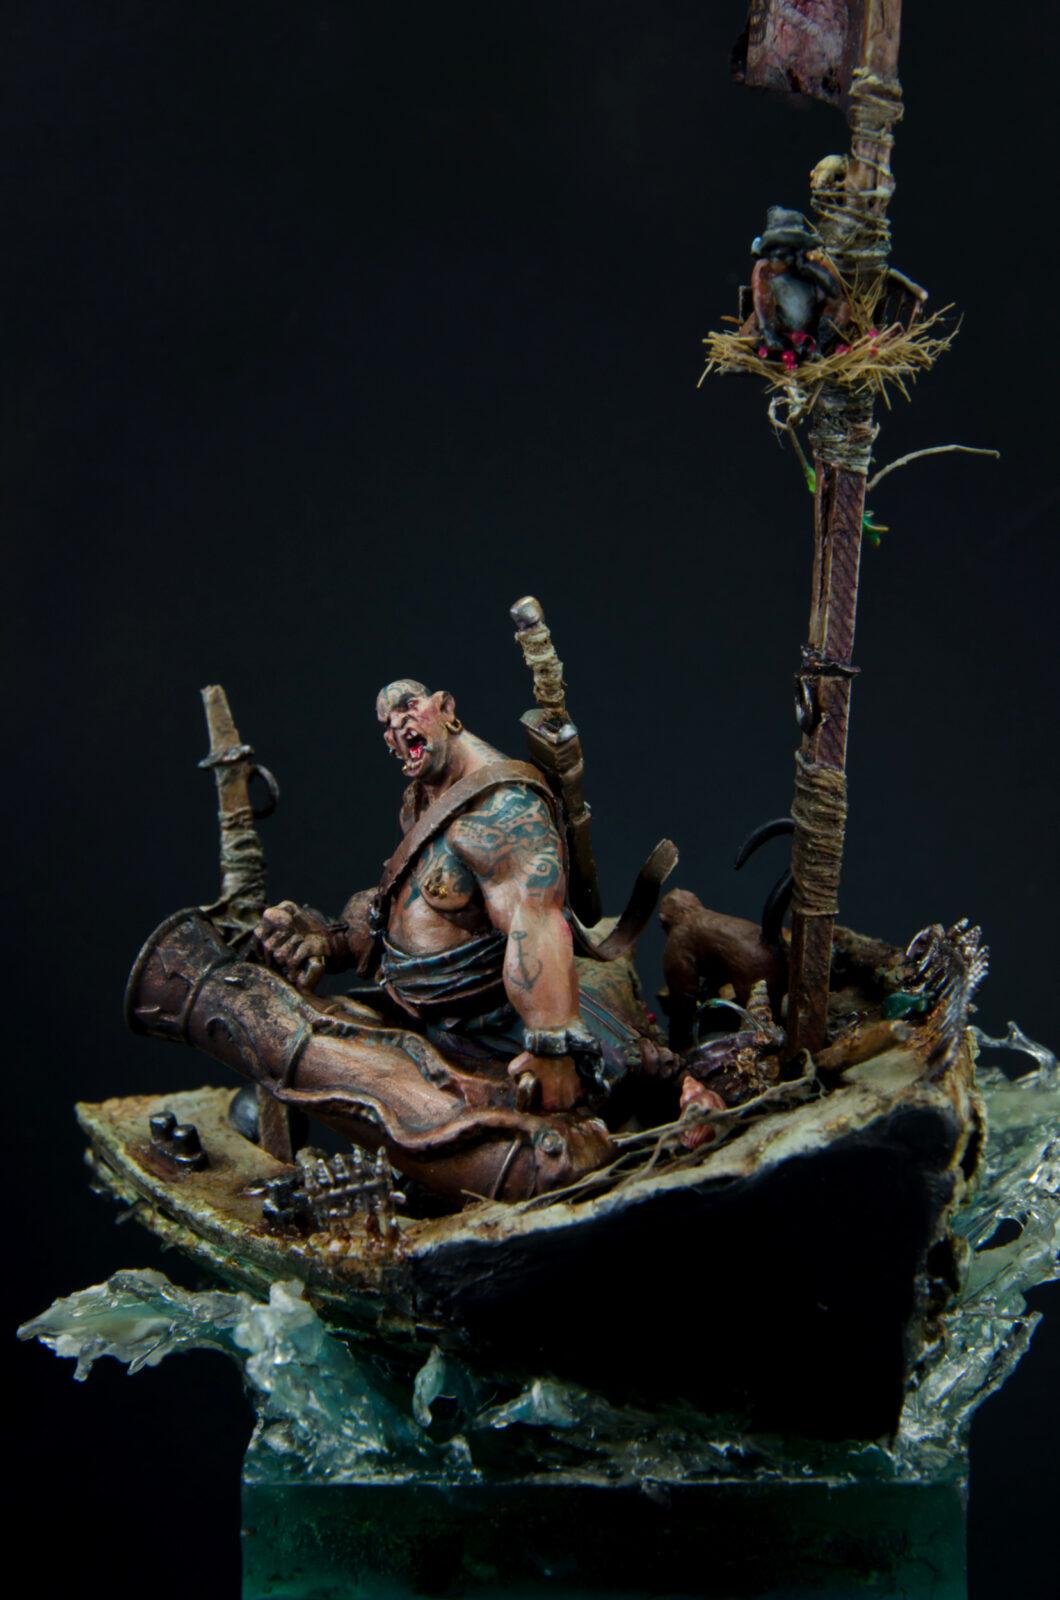 Piratbig03